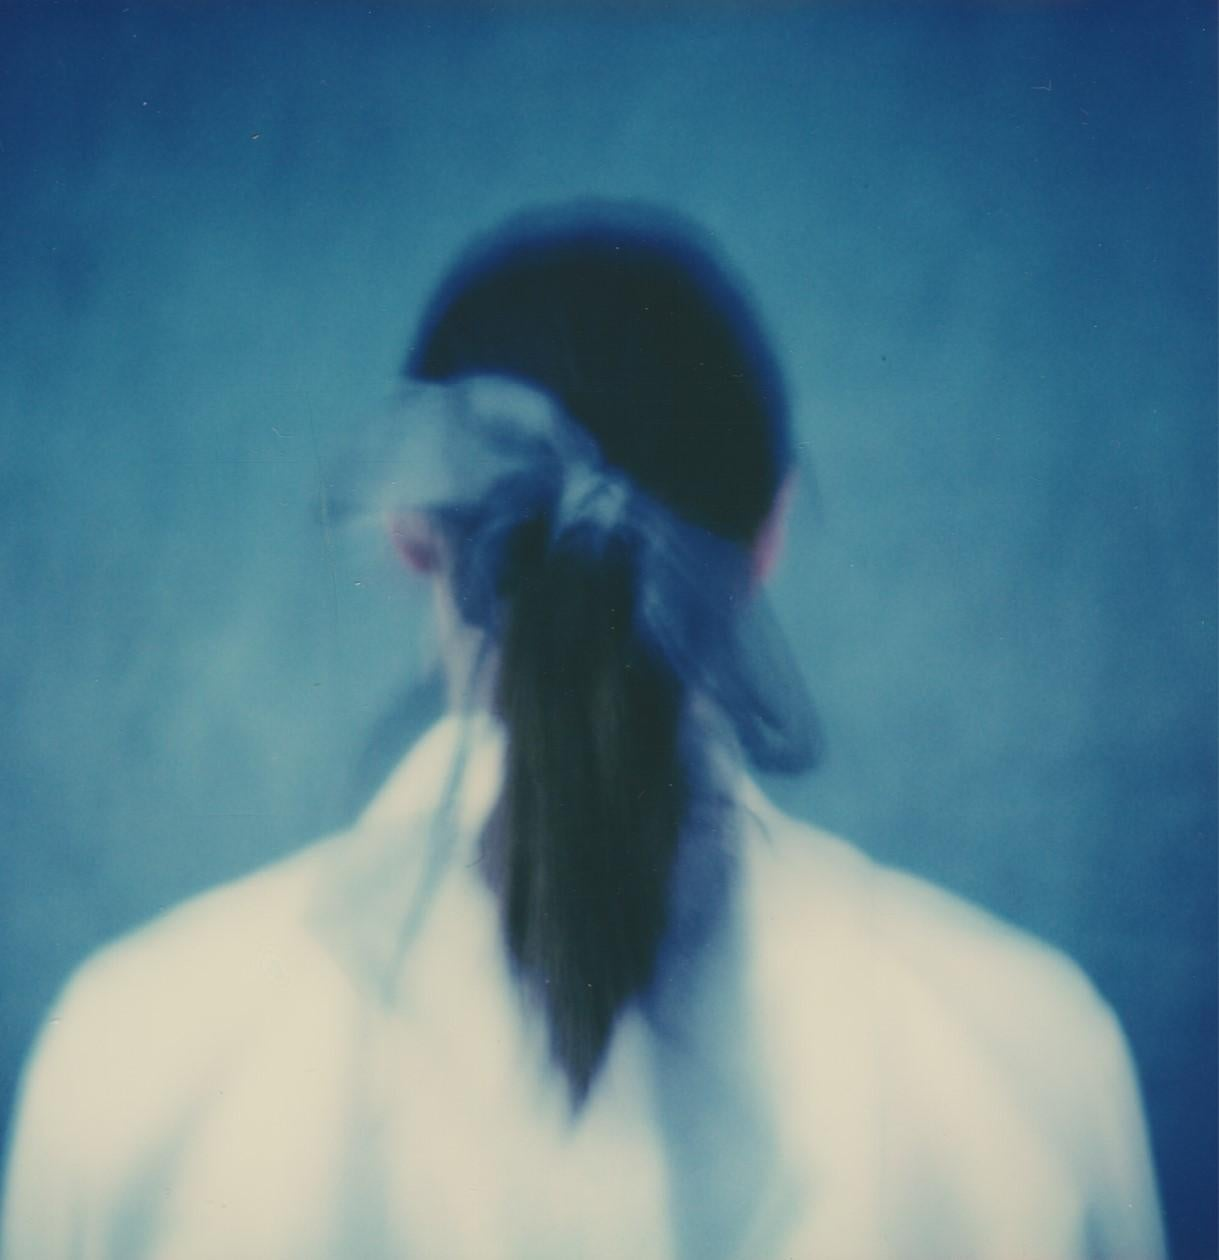 Blue Ribbon - Portrait Cyanotype Style Film Photographic Print Framed